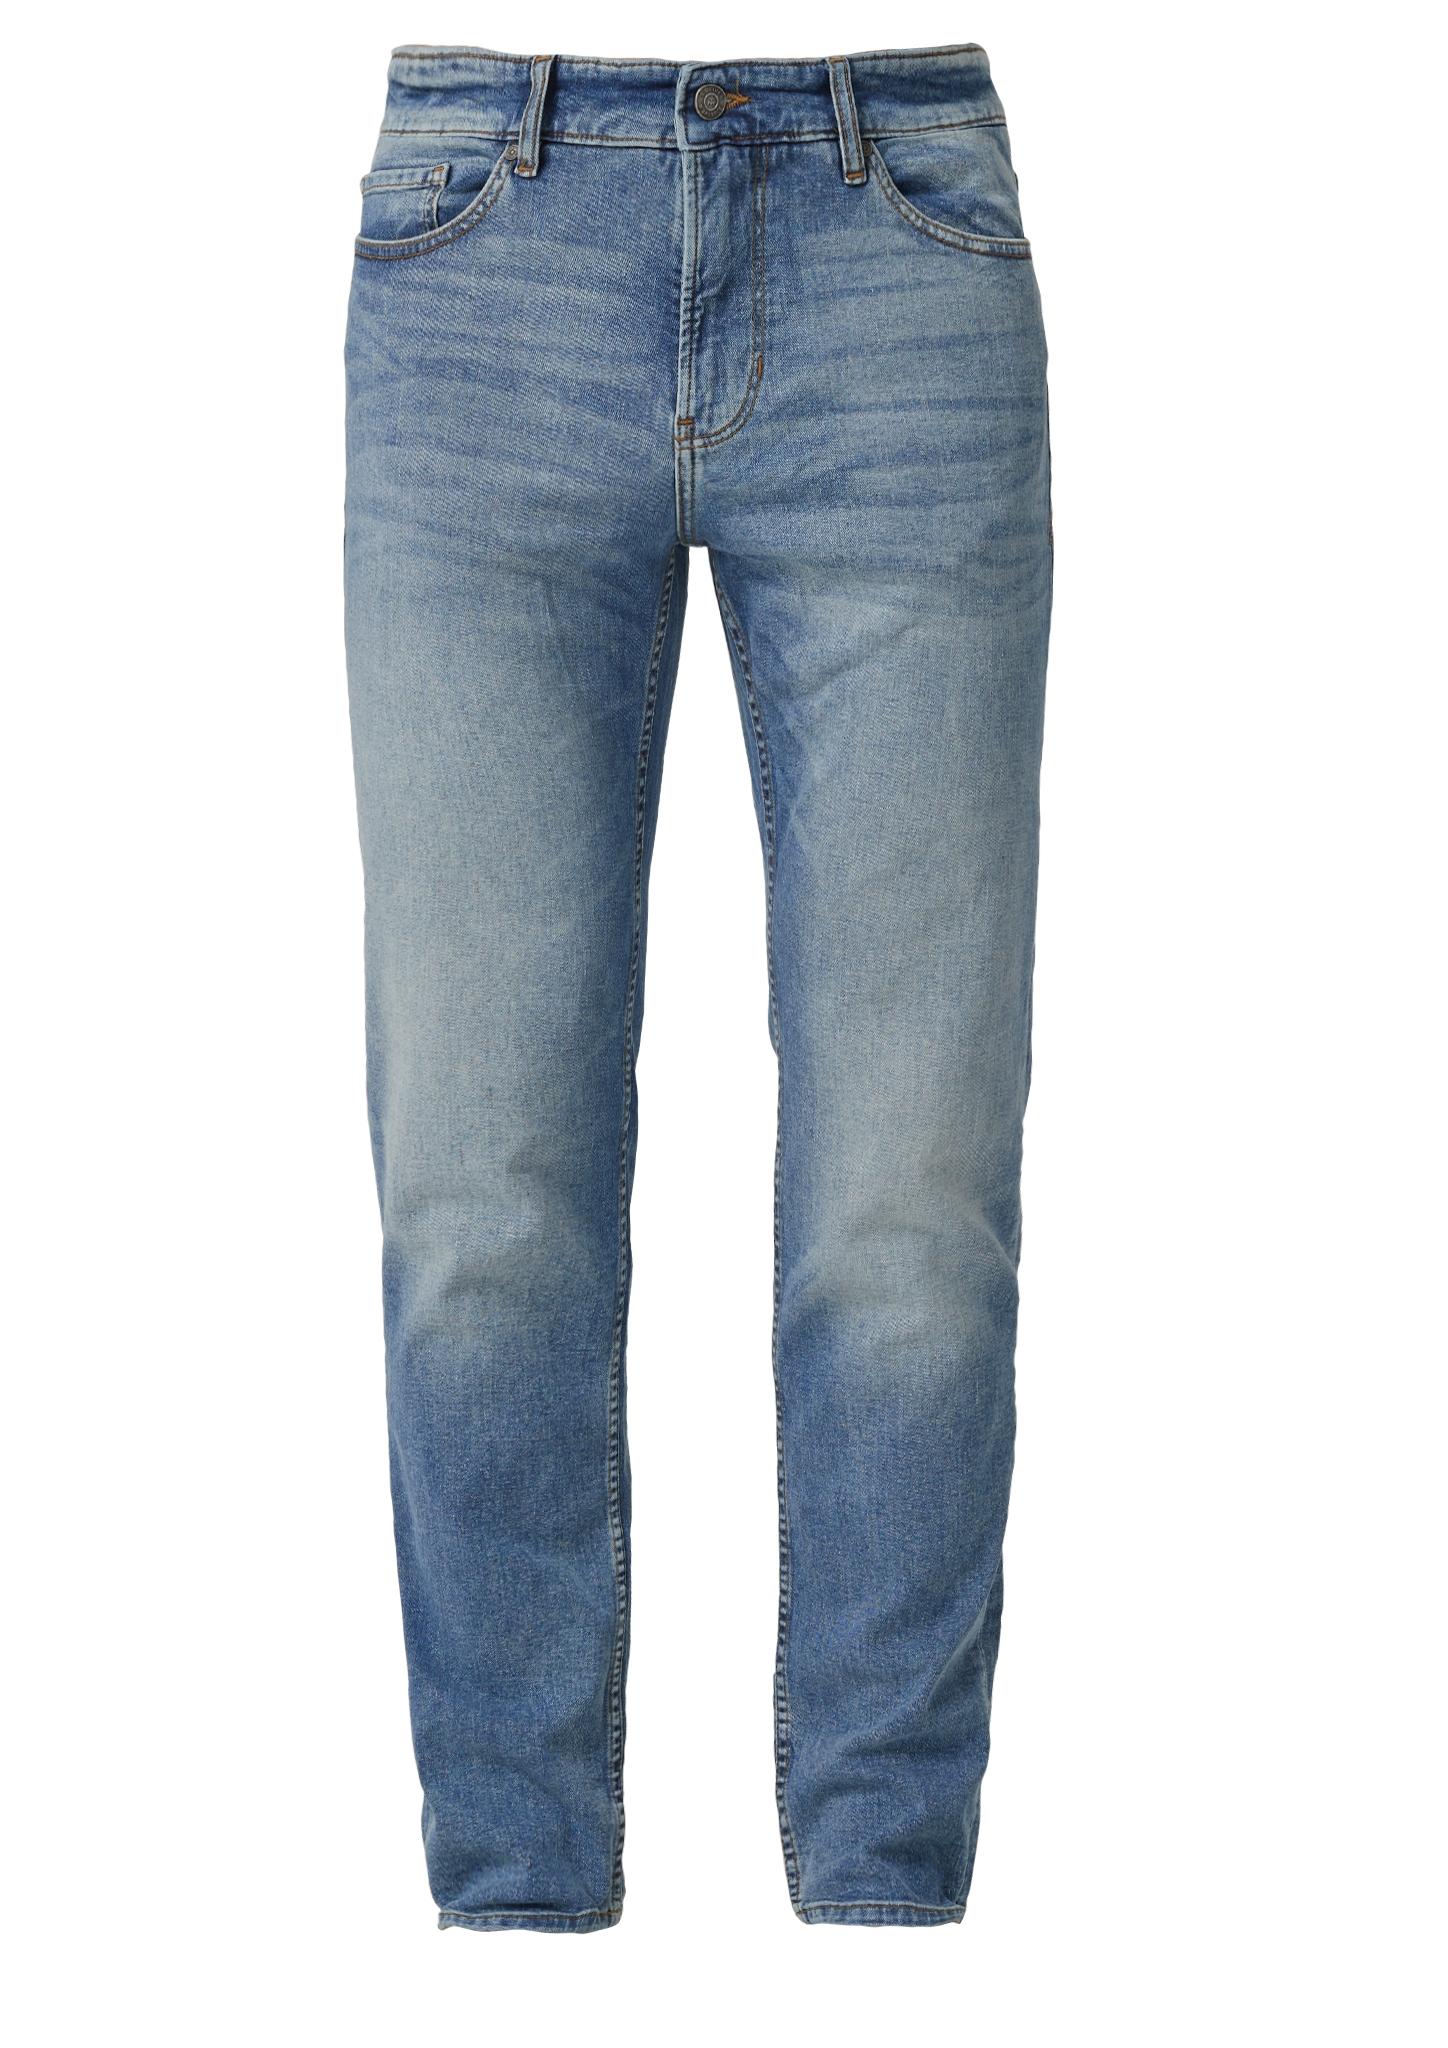 Stretchjeans   Bekleidung > Jeans > Sonstige Jeans   Blau   Oberstoff: 98% baumwolle -  2% elasthan  futter: 65% polyester -  35% baumwolle   s.Oliver